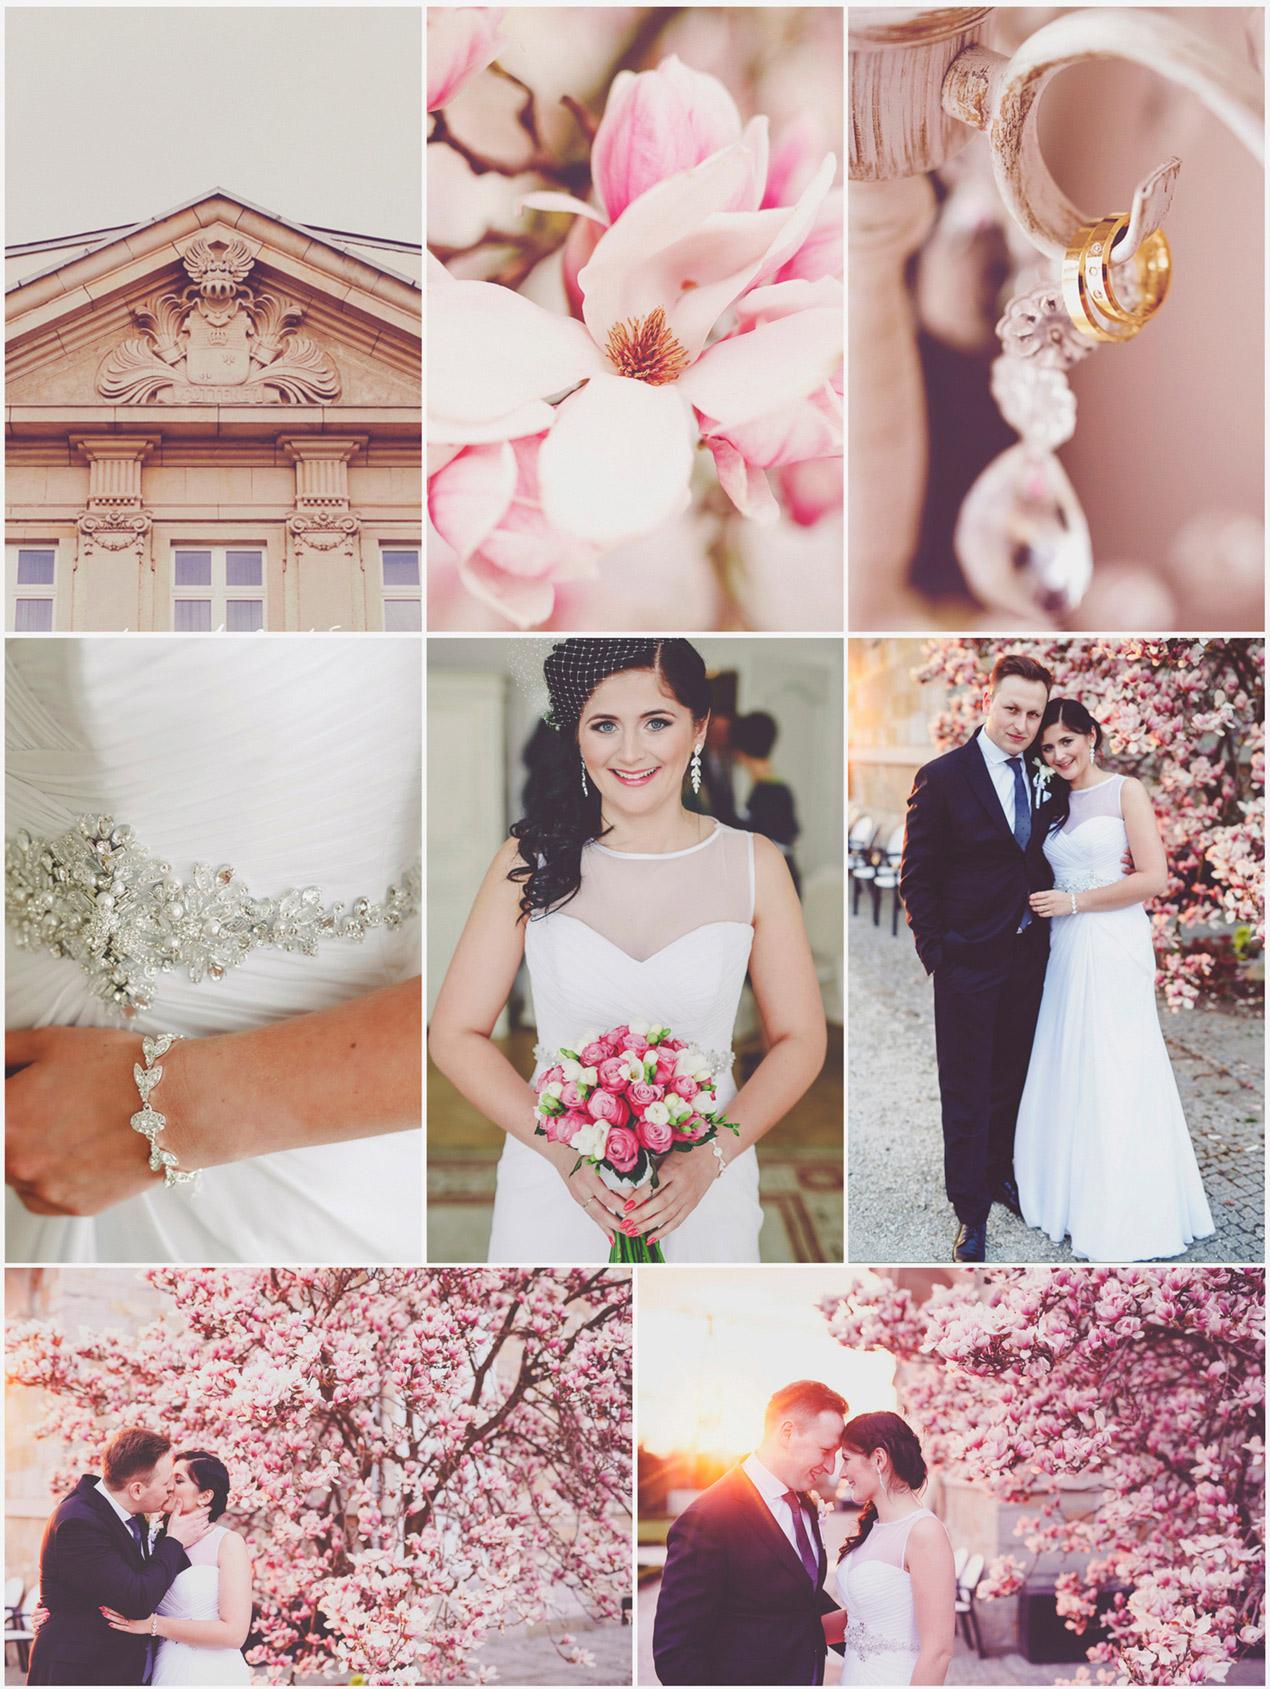 VeryLuckyStar_Pałac-Brunów-ślub-Vintage-kwitnące-magnolie